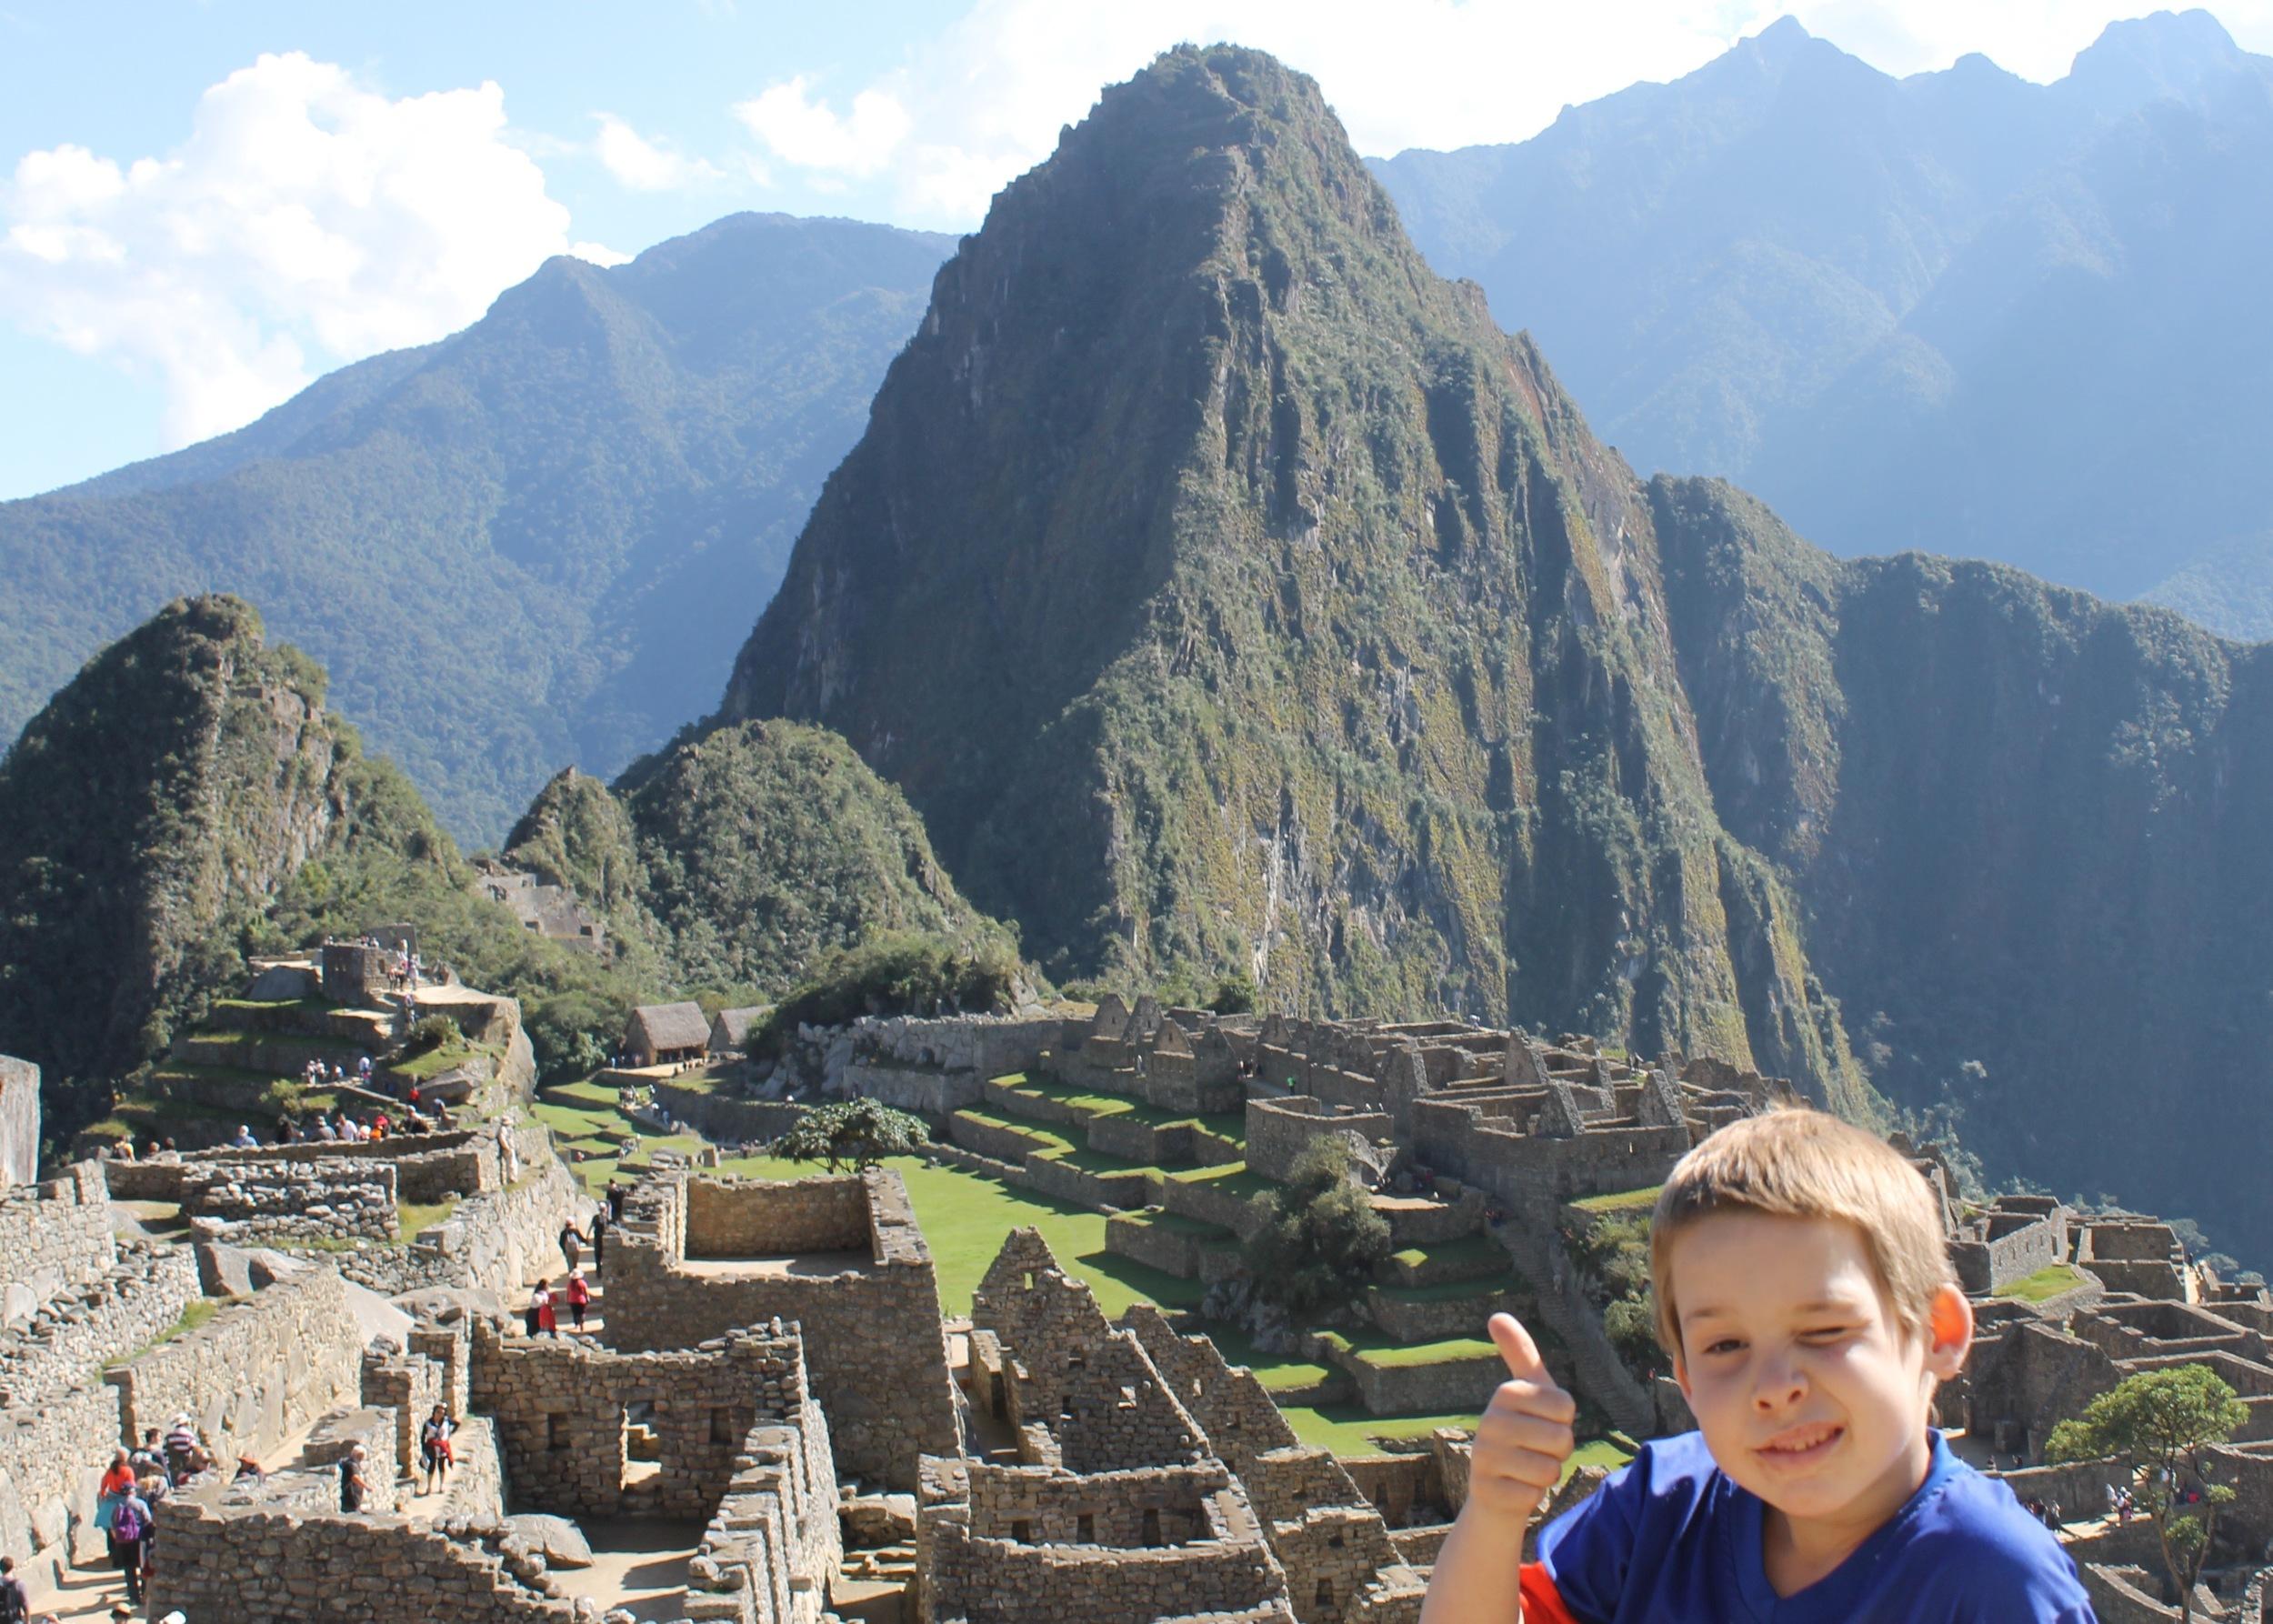 Joel's impression of Machu Picchu